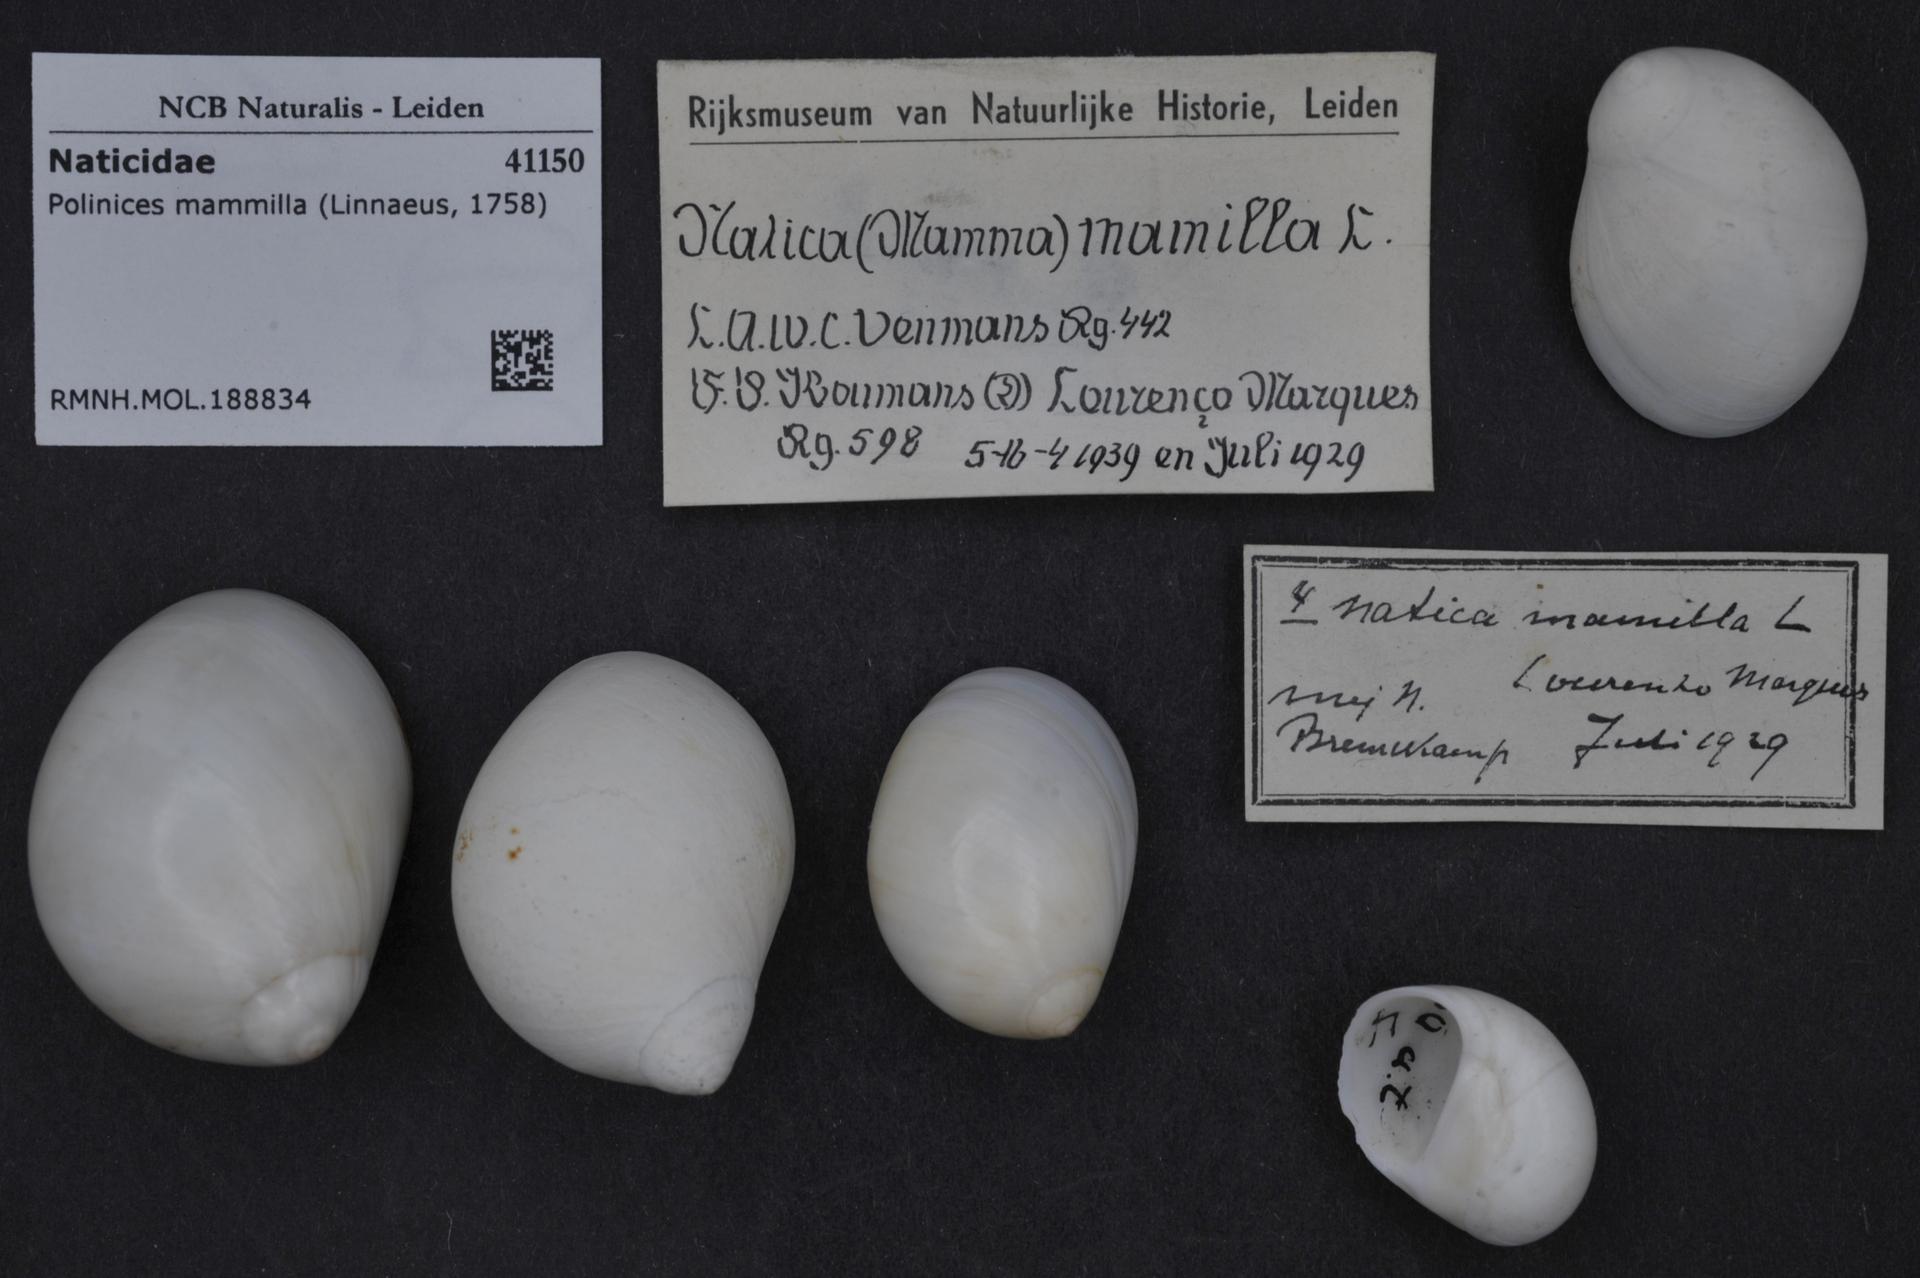 RMNH.MOL.188834 | Polinices mammilla (Linnaeus, 1758)